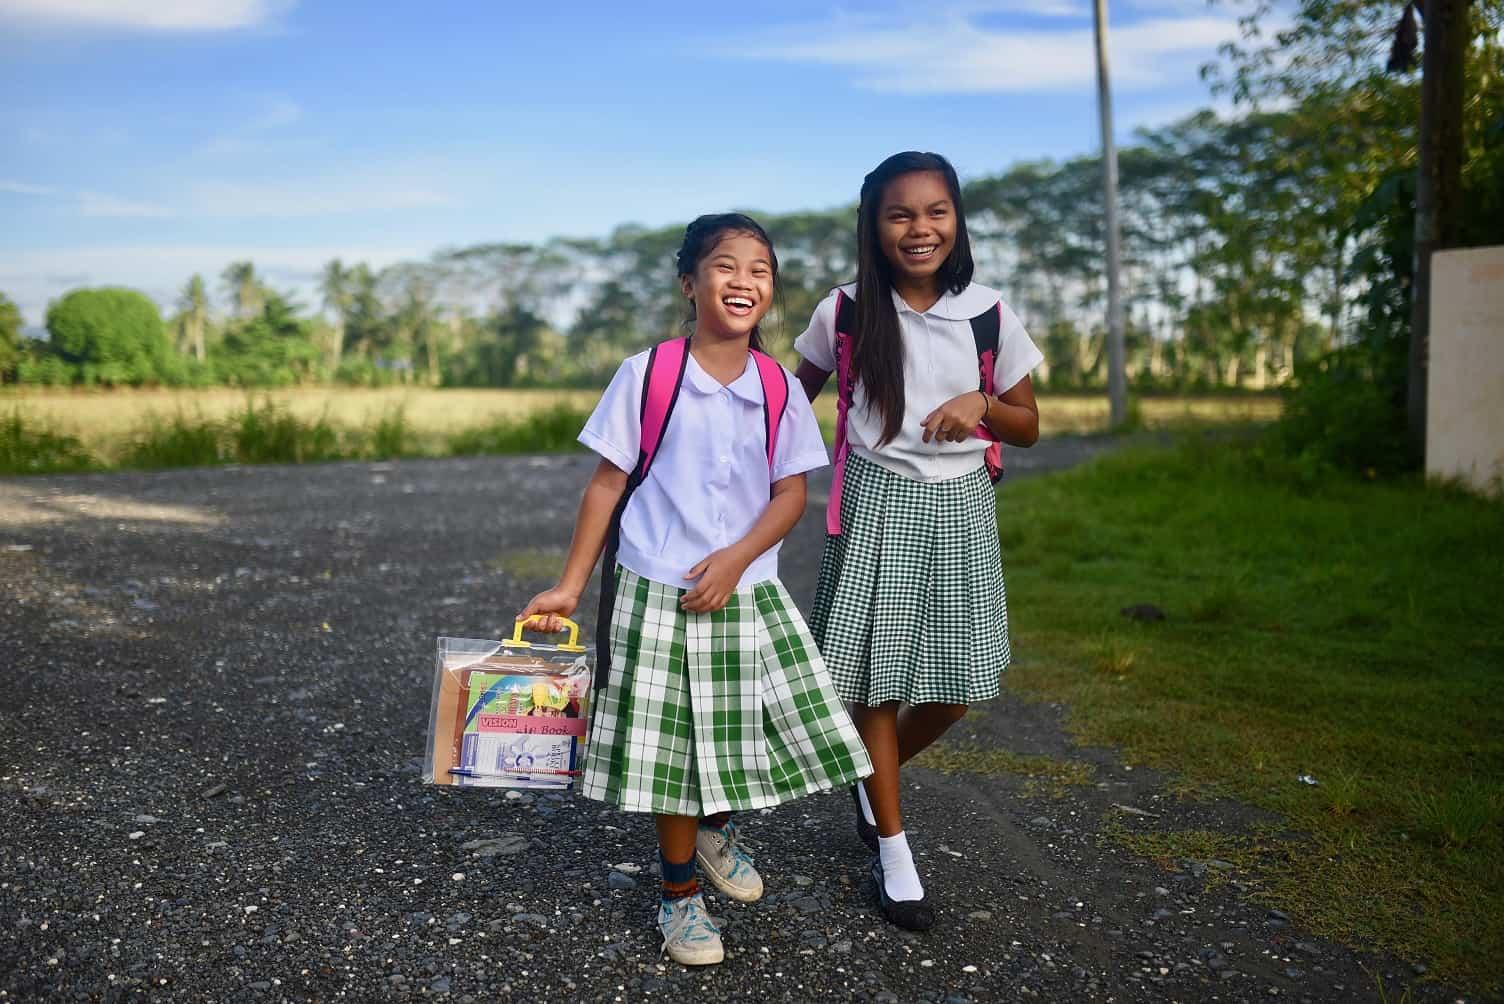 soziale-projekte-strassenkinder-schule